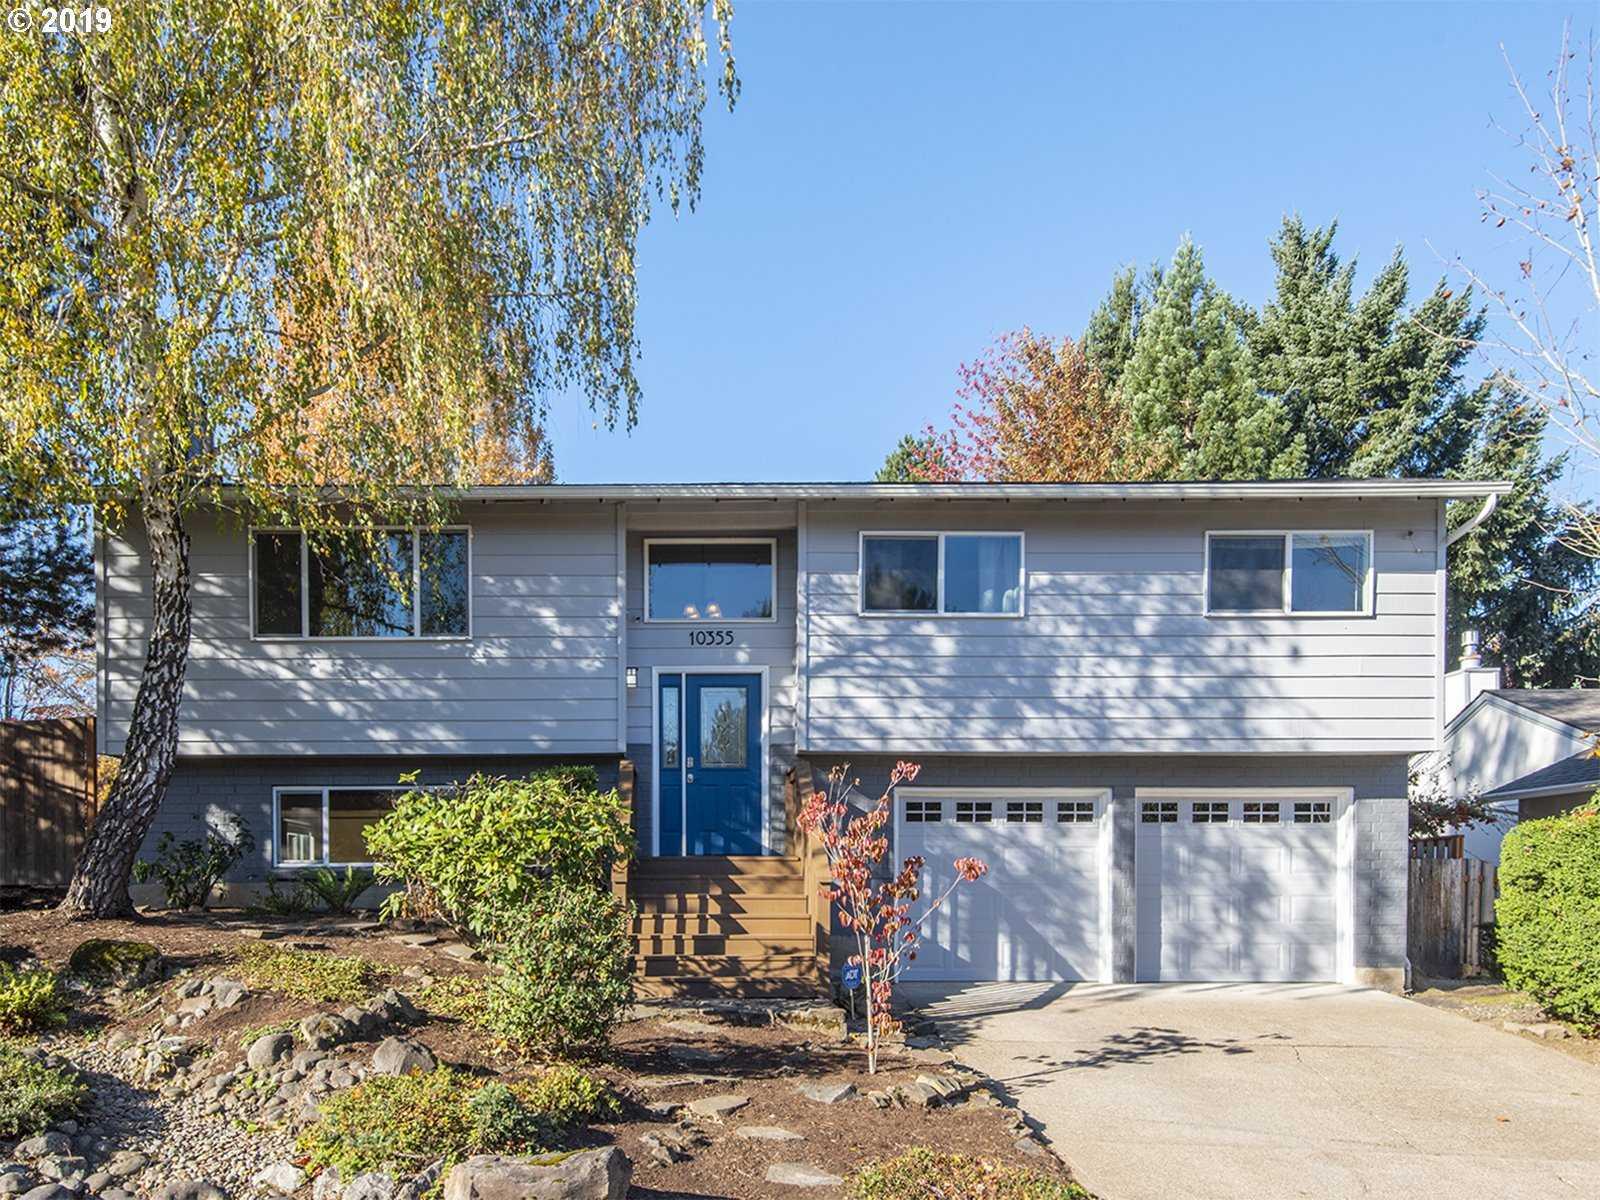 $485,000 - 3Br/3Ba -  for Sale in Sw Beaverton, Beaverton